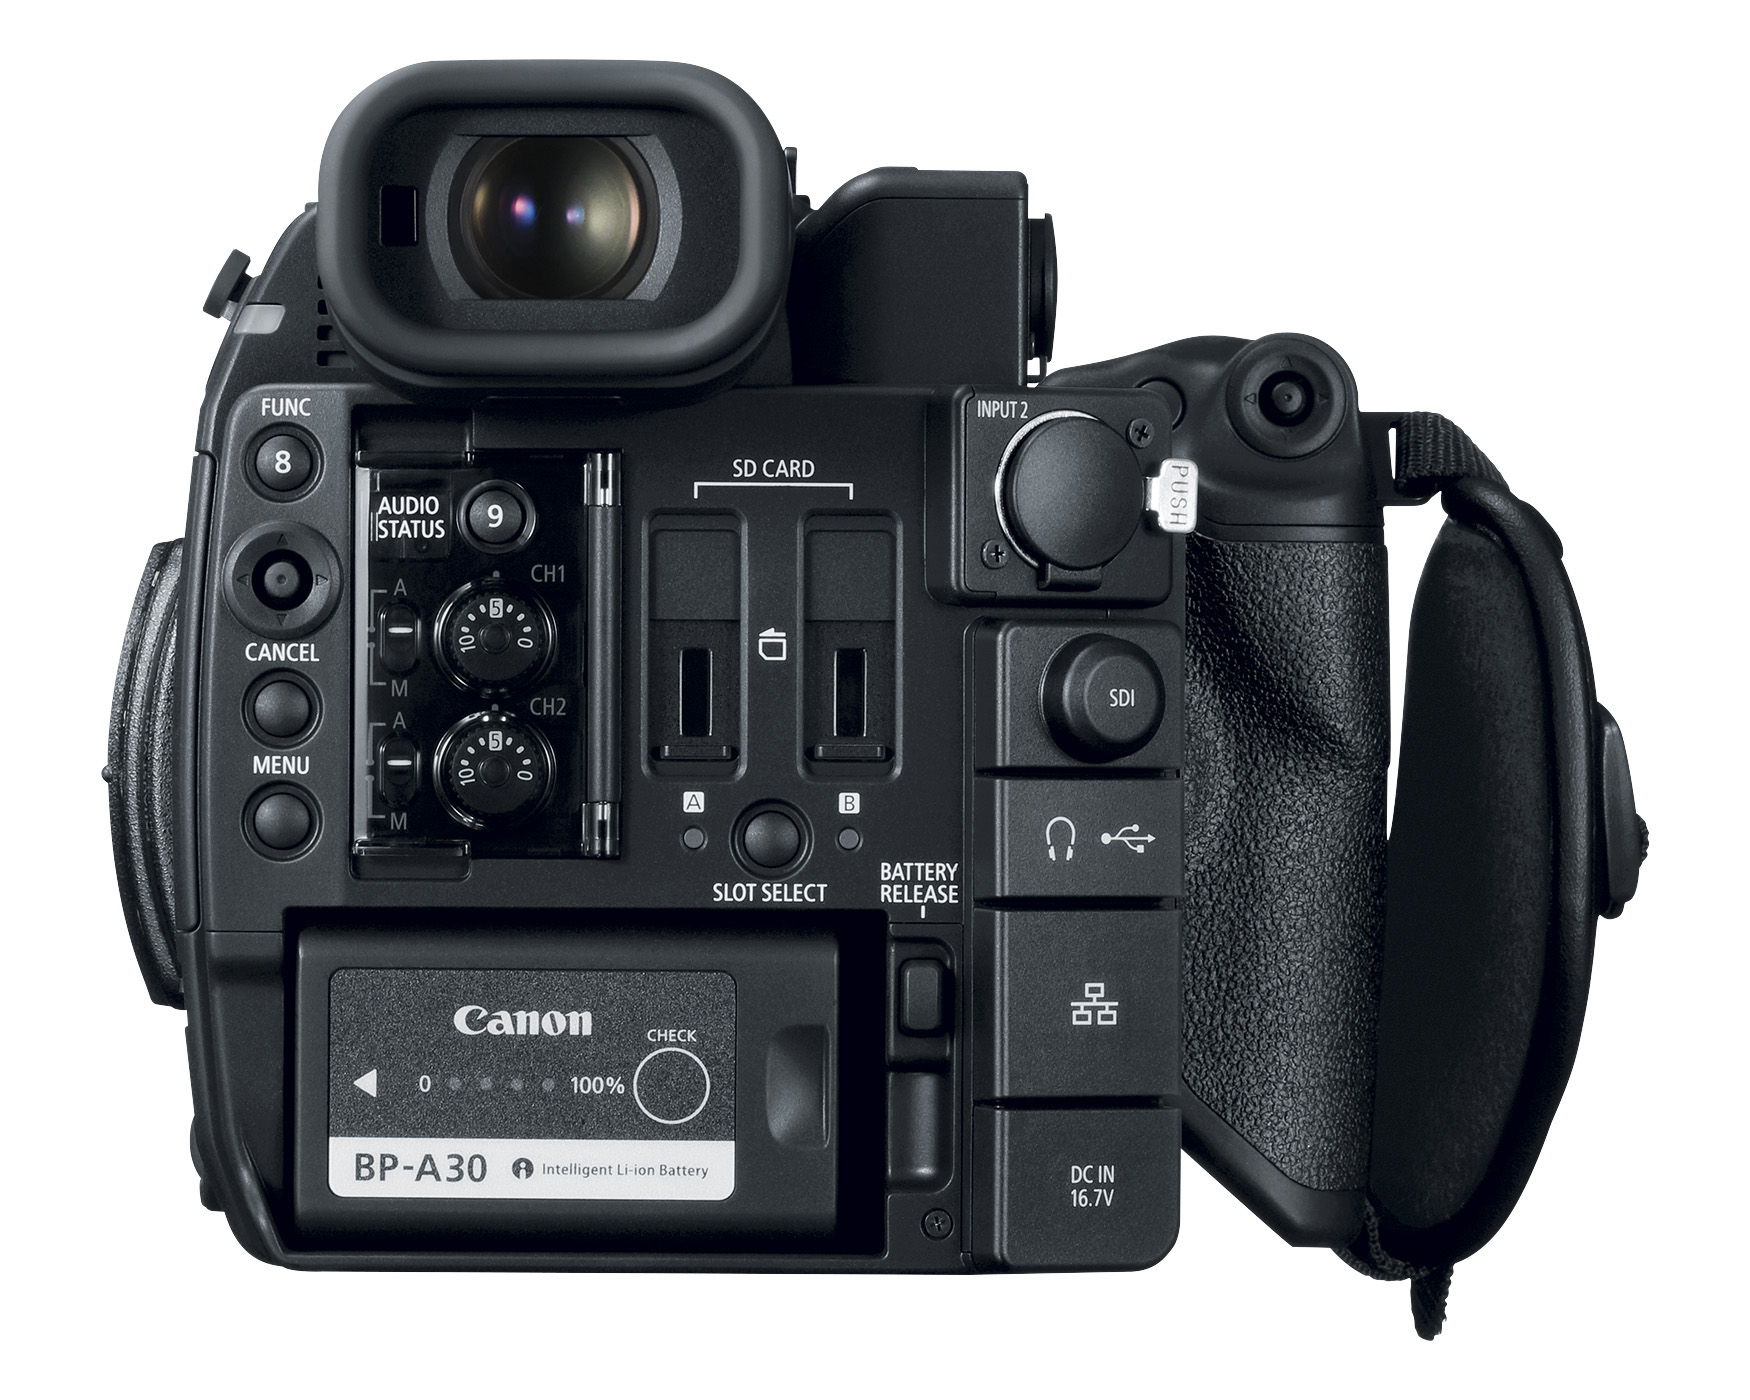 c2001.jpg